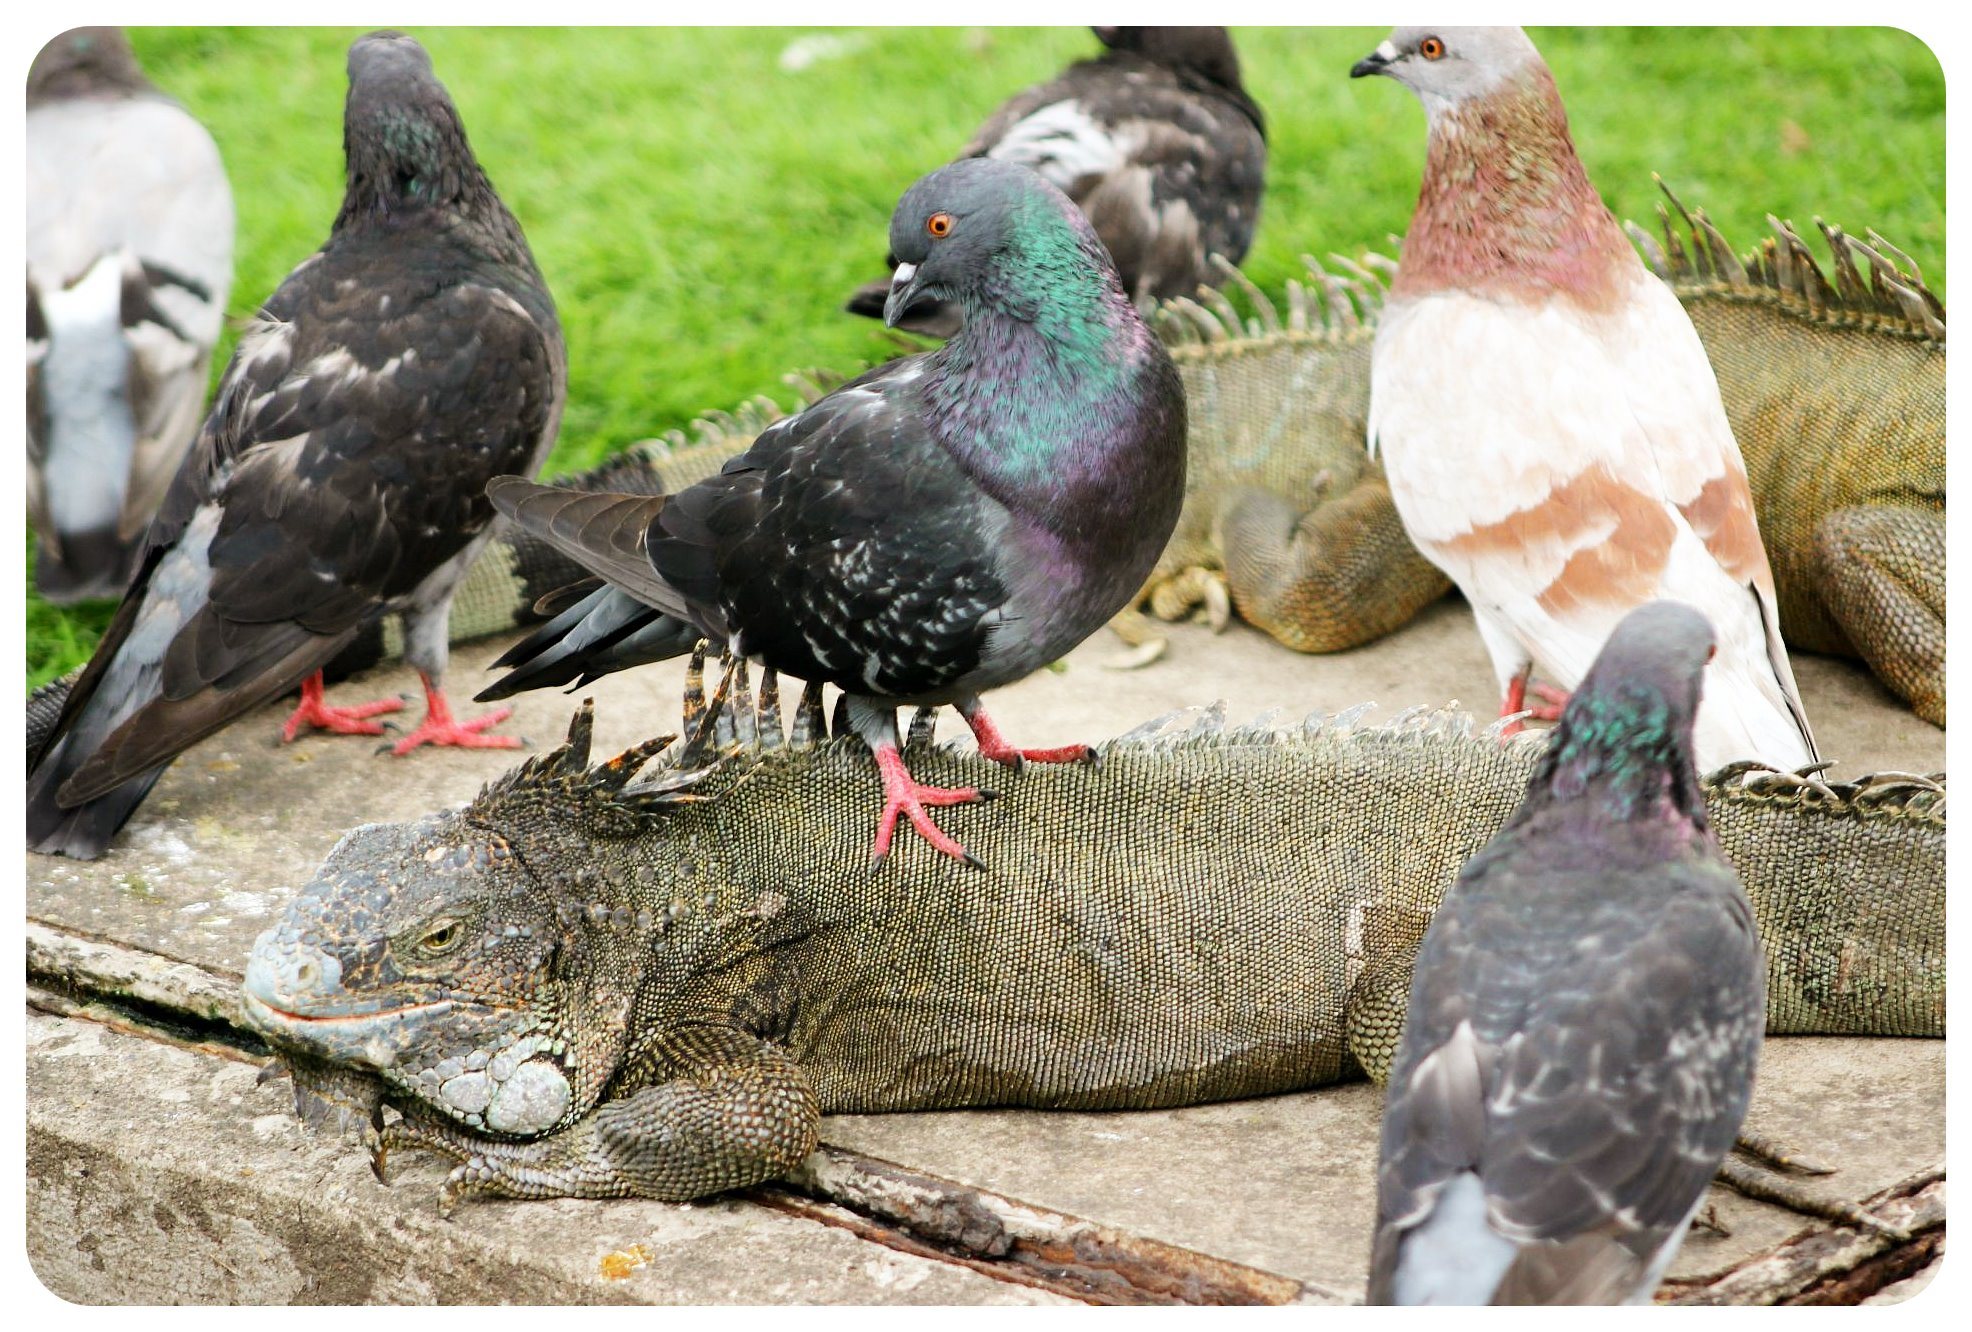 guayaquil iguana & pidgeons